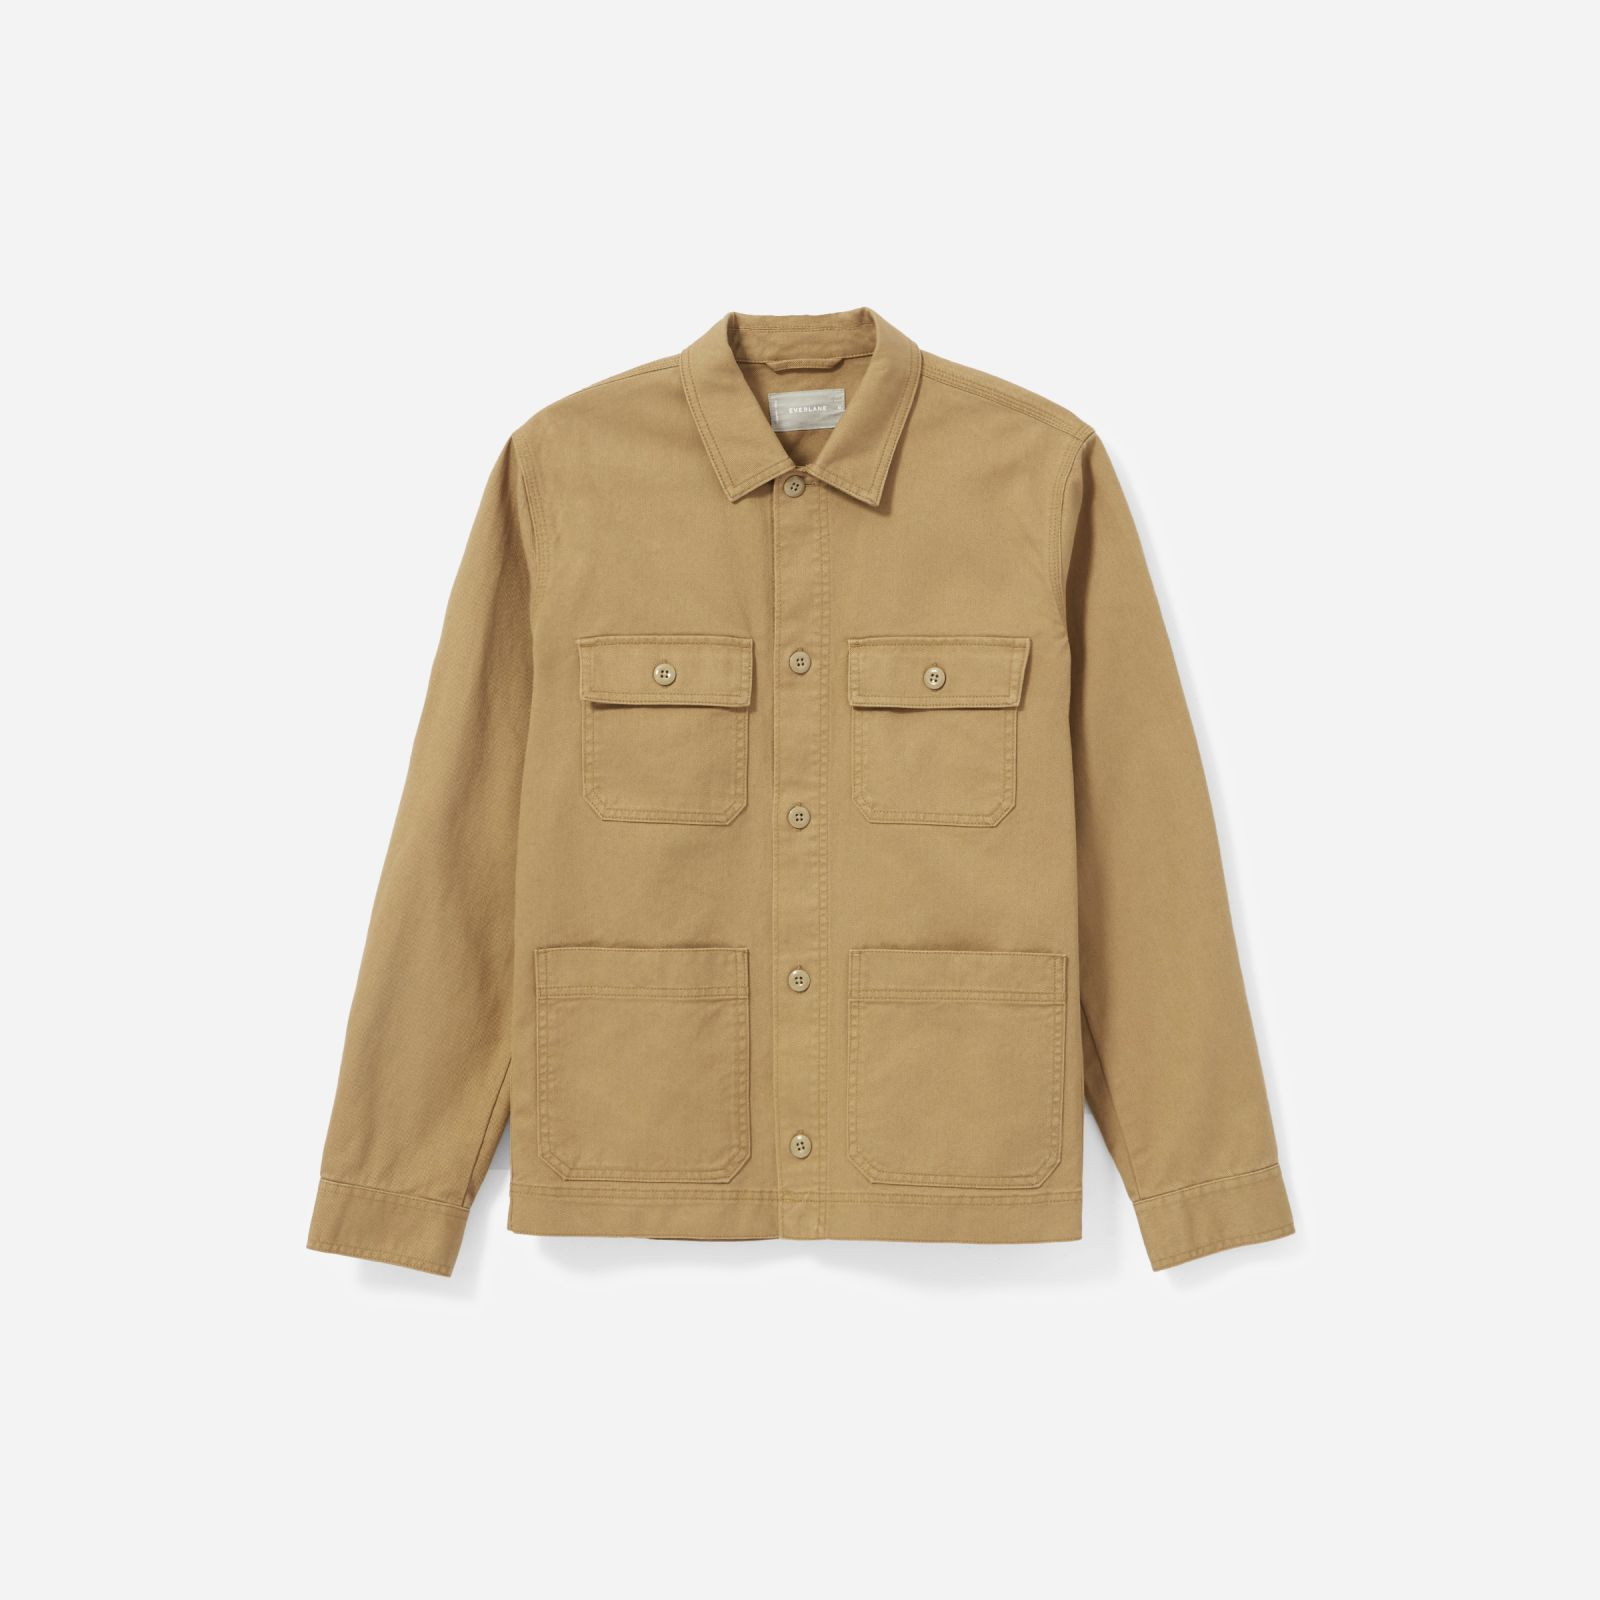 men's chore jacket by everlane in ochre, size l